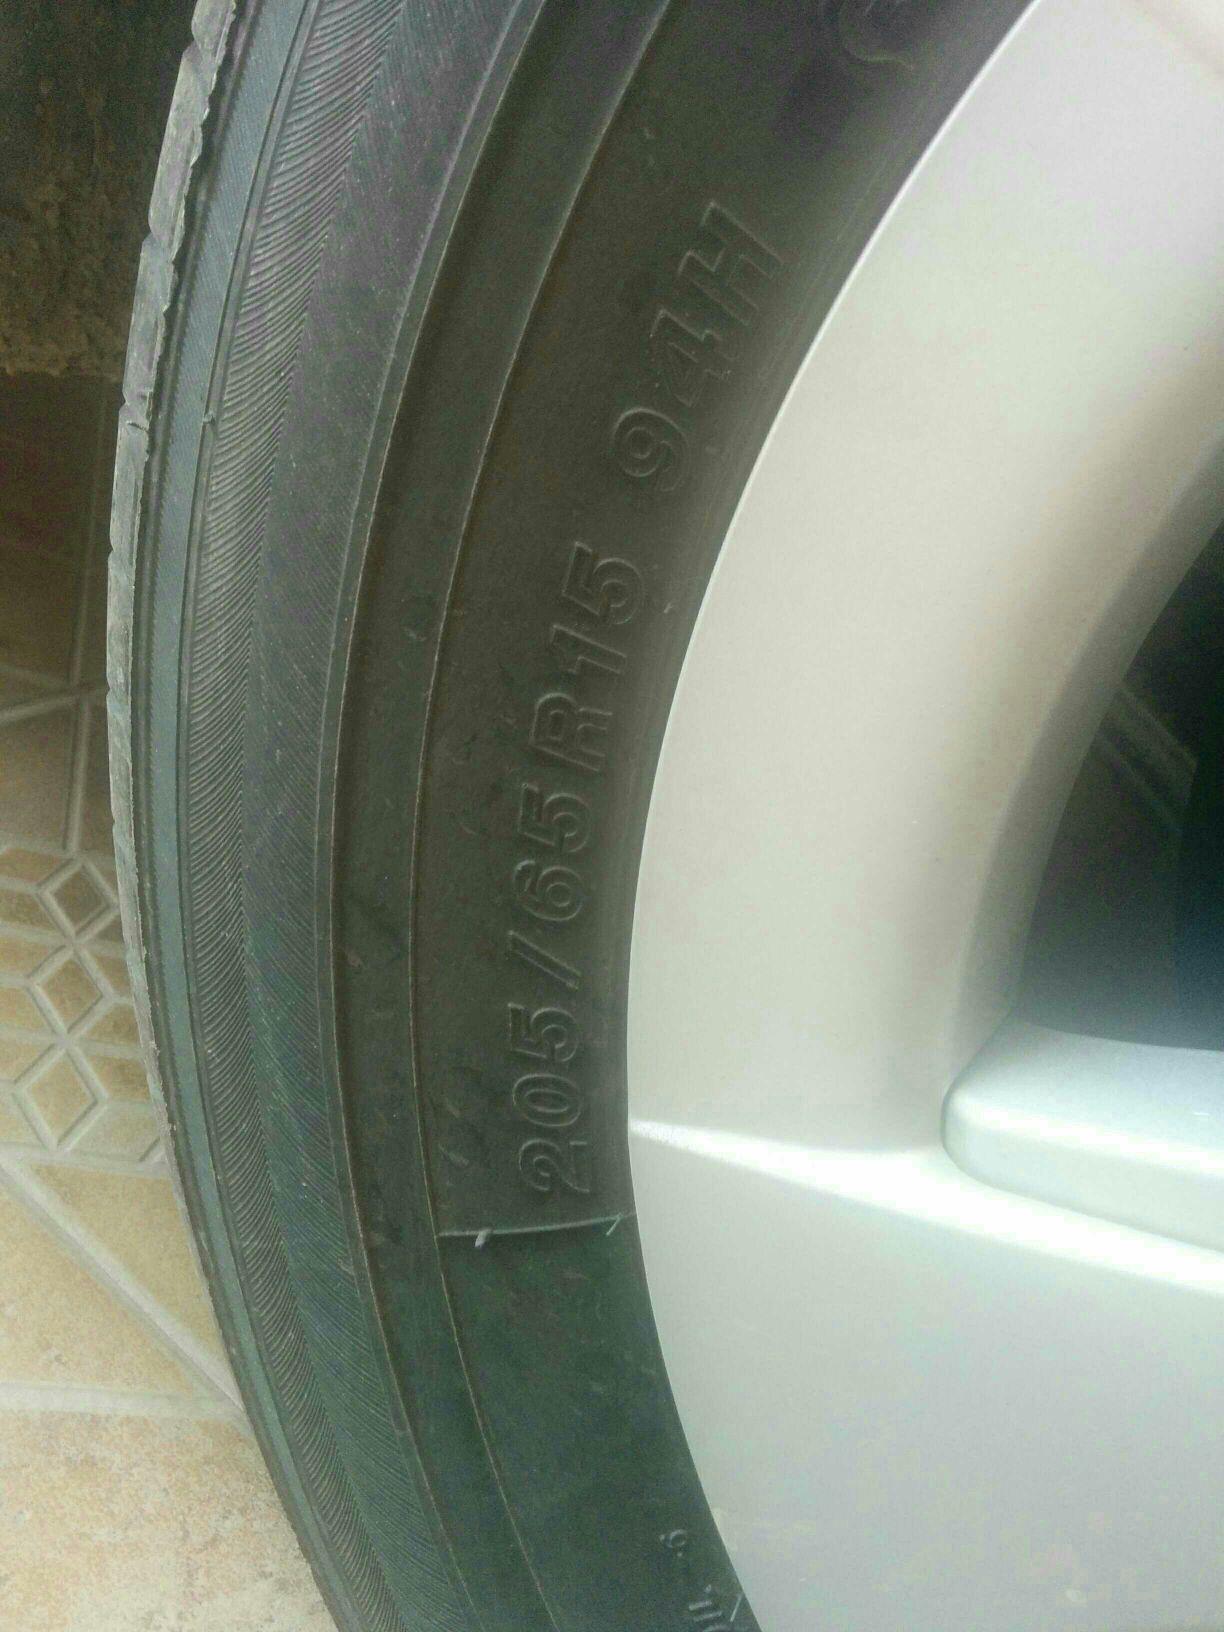 Toyota Prius fan club - ee305afd0a2ea86e2a71e60d8e638f18